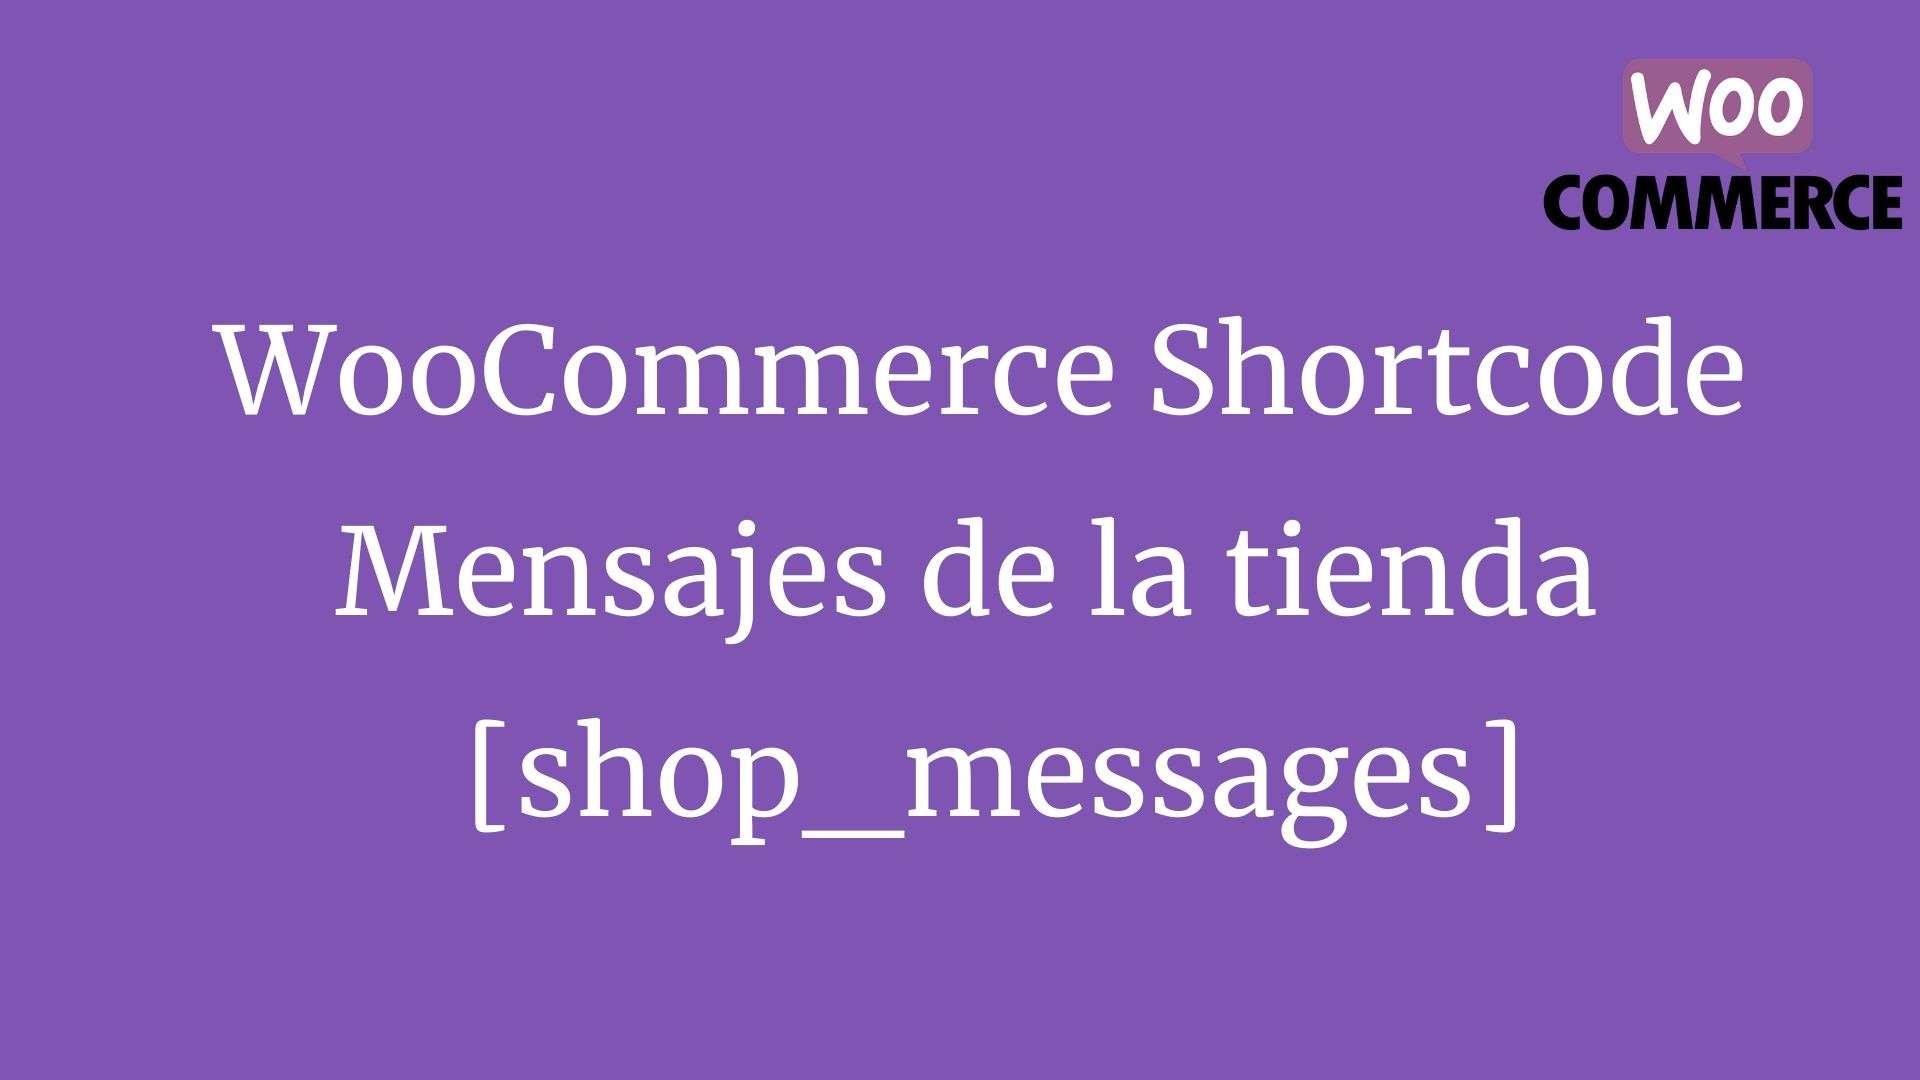 WooCommerce Shortcode Mensajes de la tienda shop_messages